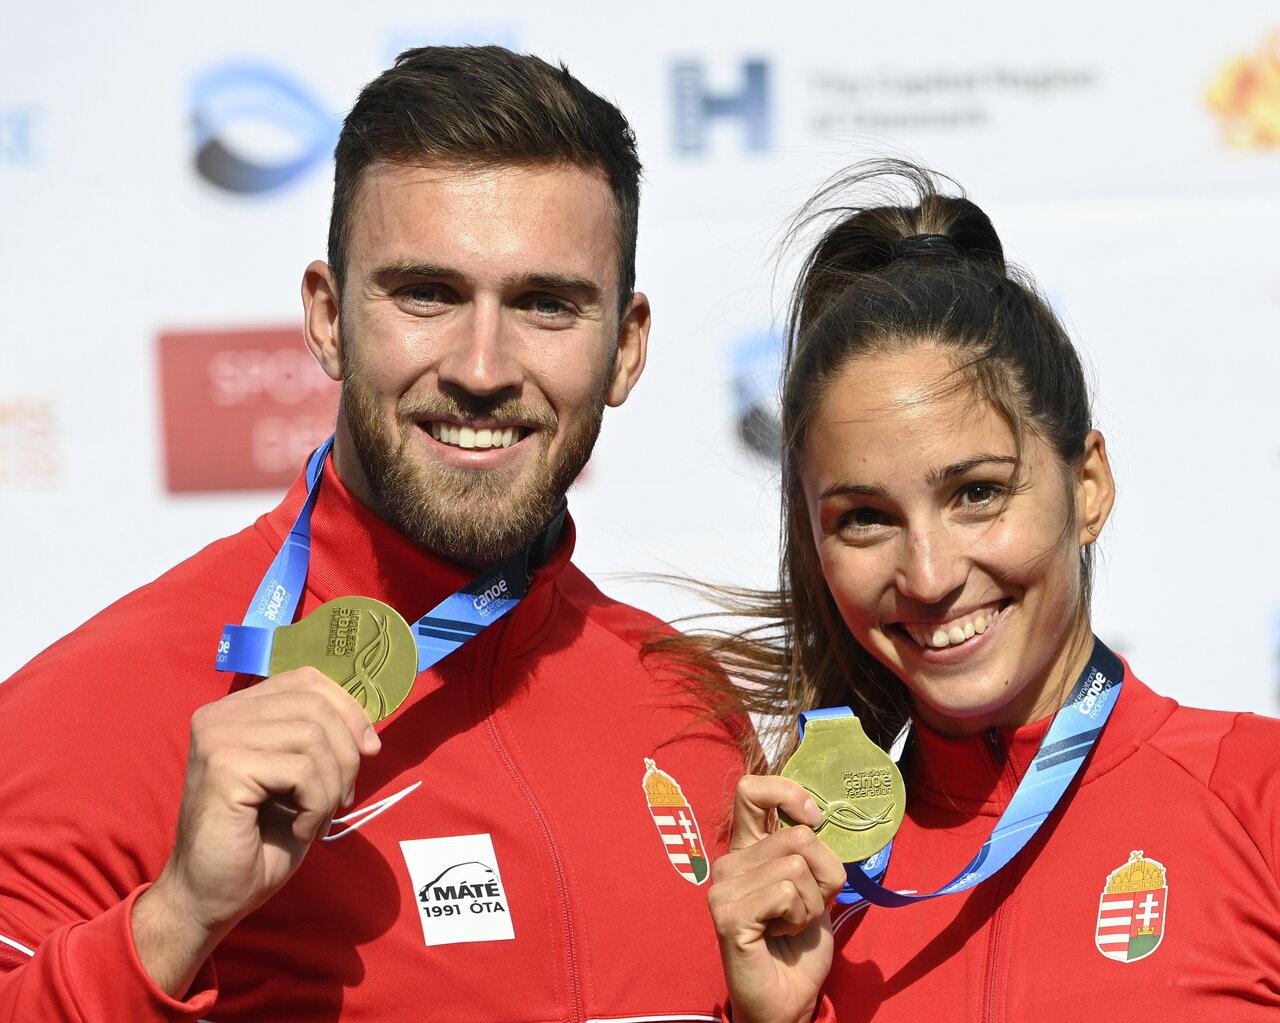 2021 ICF Canoe Sprint World Championships 13